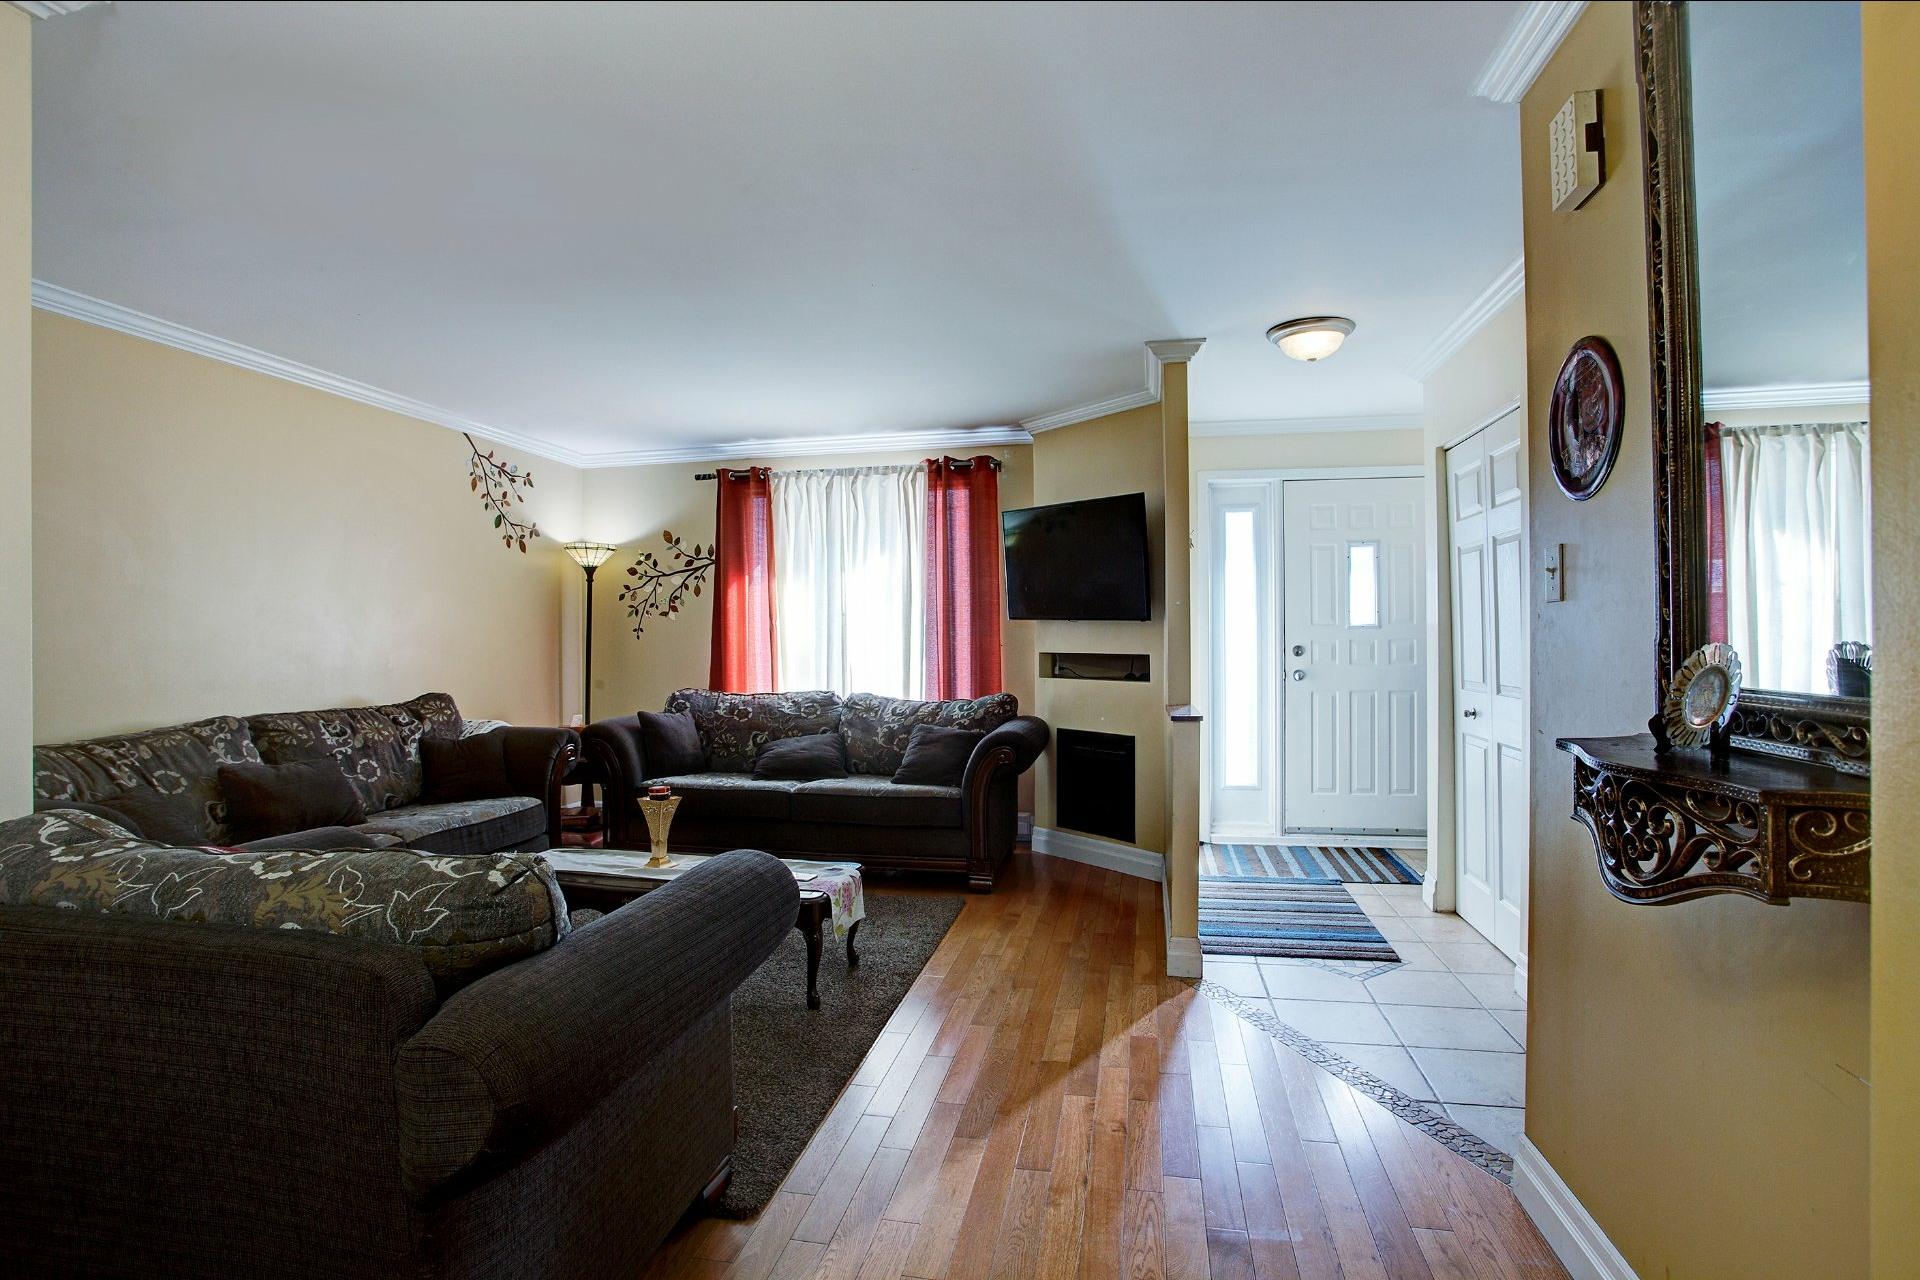 image 2 - MX - Casa sola - MX En venta Lachine Montréal  - 10 habitaciones